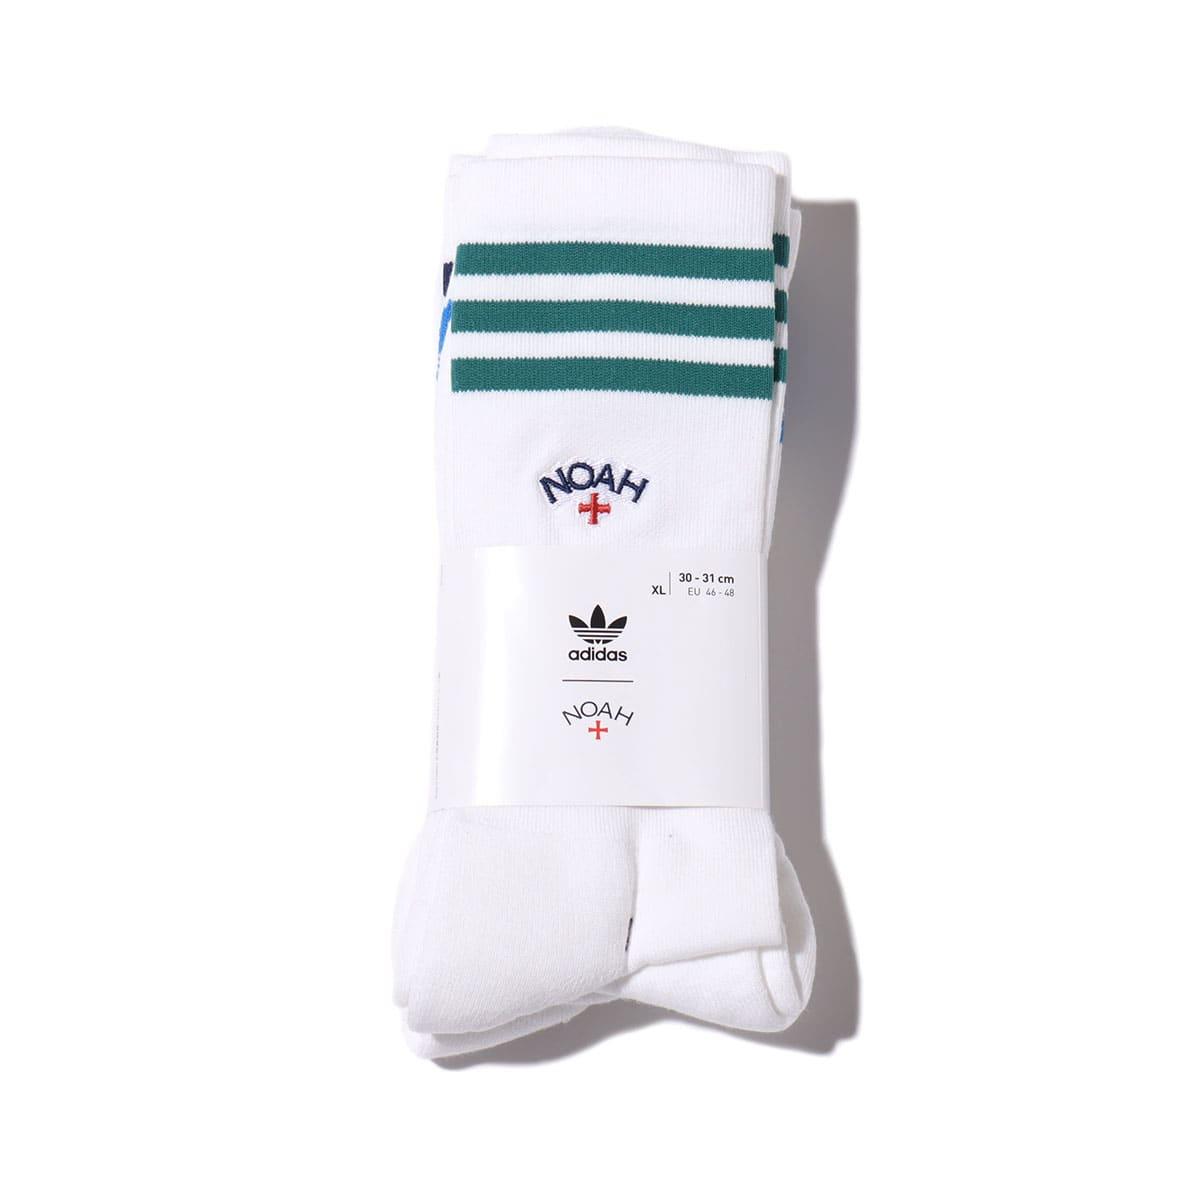 adidas NOAH SOCKS WHITE/MULTICOLOR 20SS-I_photo_large